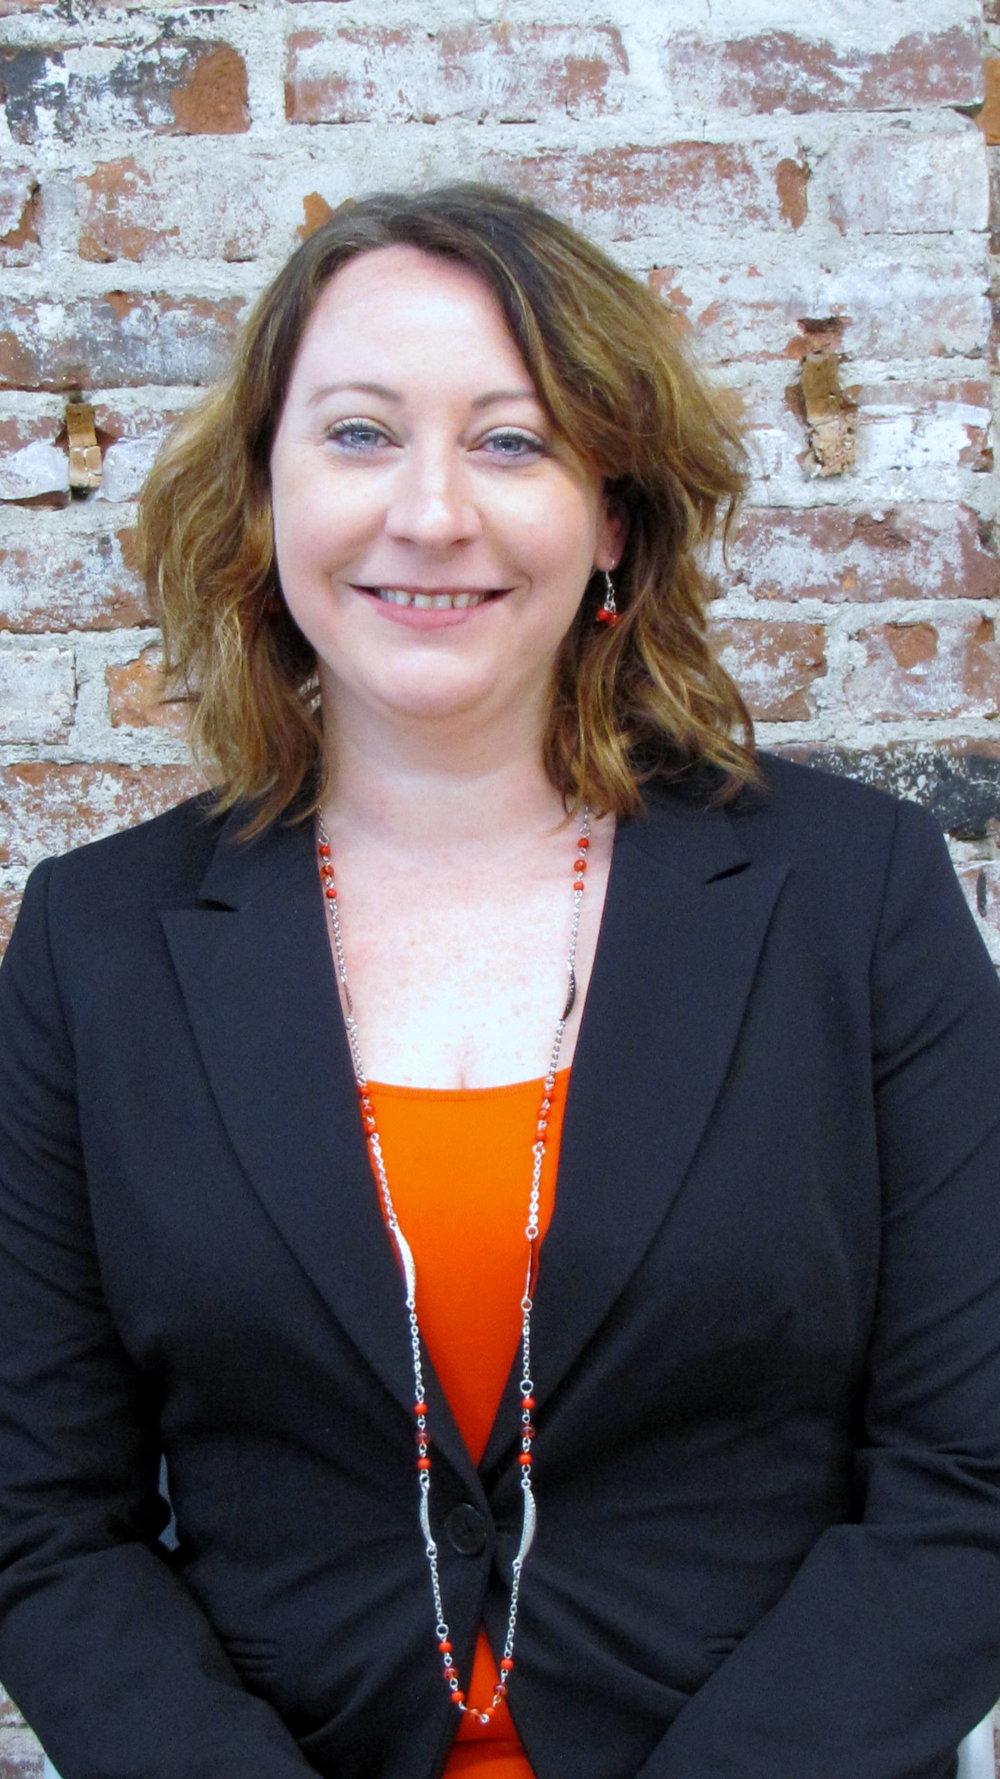 Miranda Lough - Employer Services / Program Specialist304-424-7271 ext. 134Email Miranda